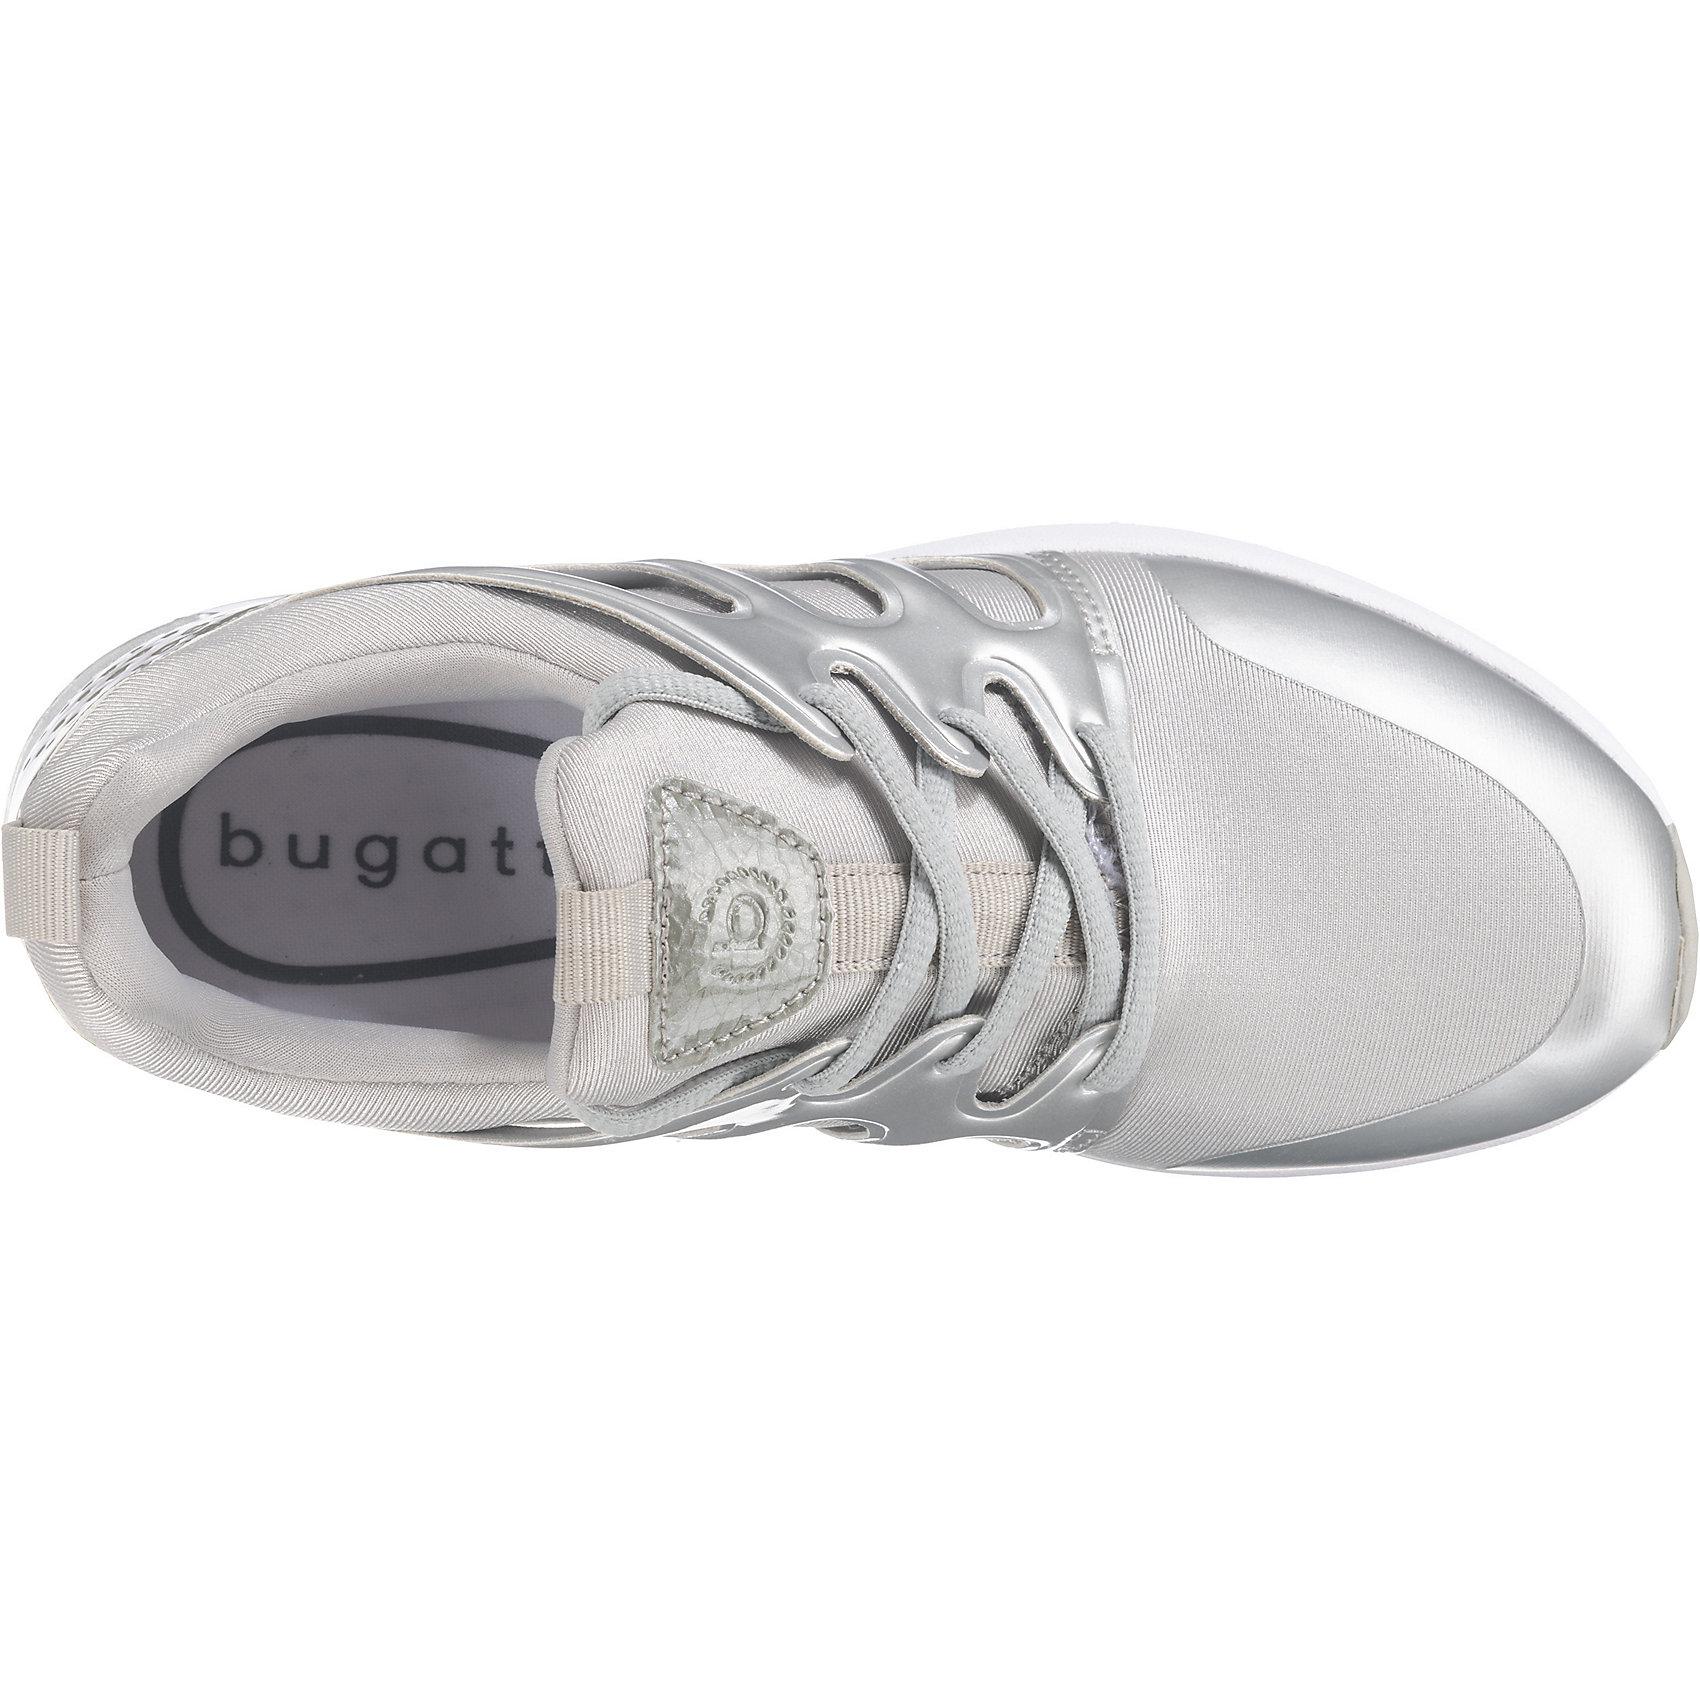 Neu Niedrig bugatti Sneakers Niedrig Neu 7572172 für Damen silber schwarz 2e536d